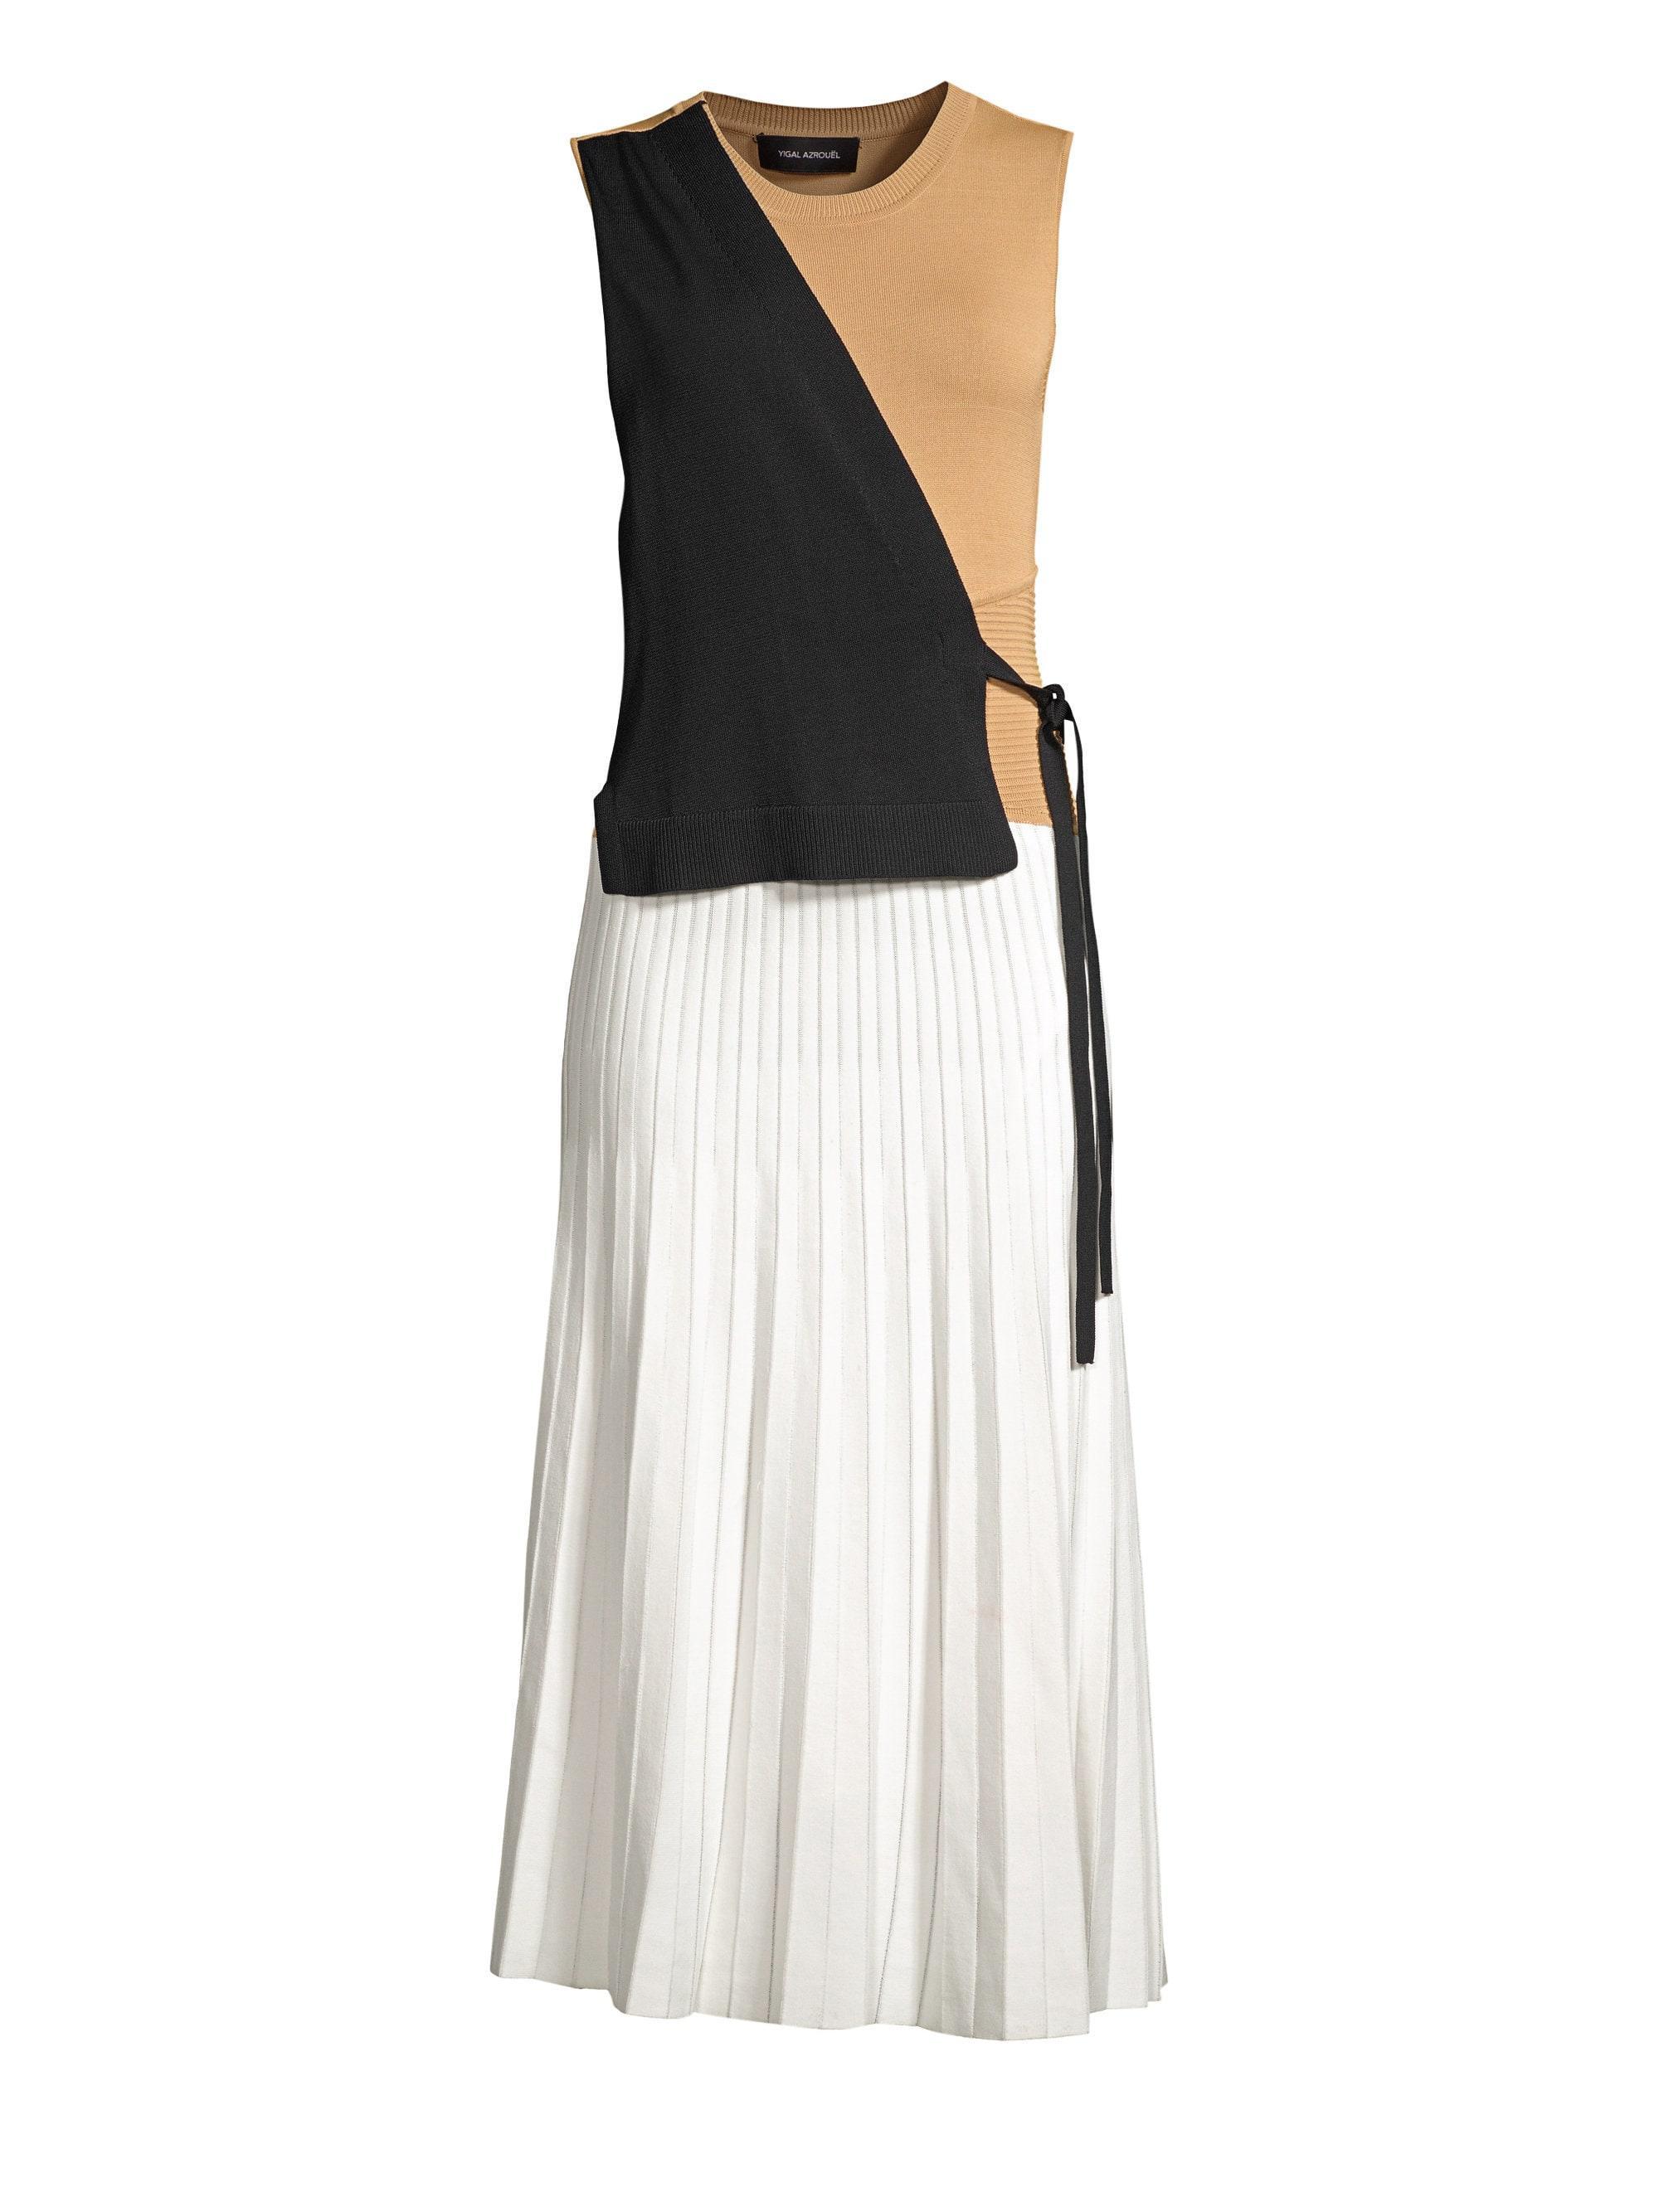 e7a4e48633ee Yigal Azrouël - Multicolor Color Block Wrap Dress - Lyst. View fullscreen